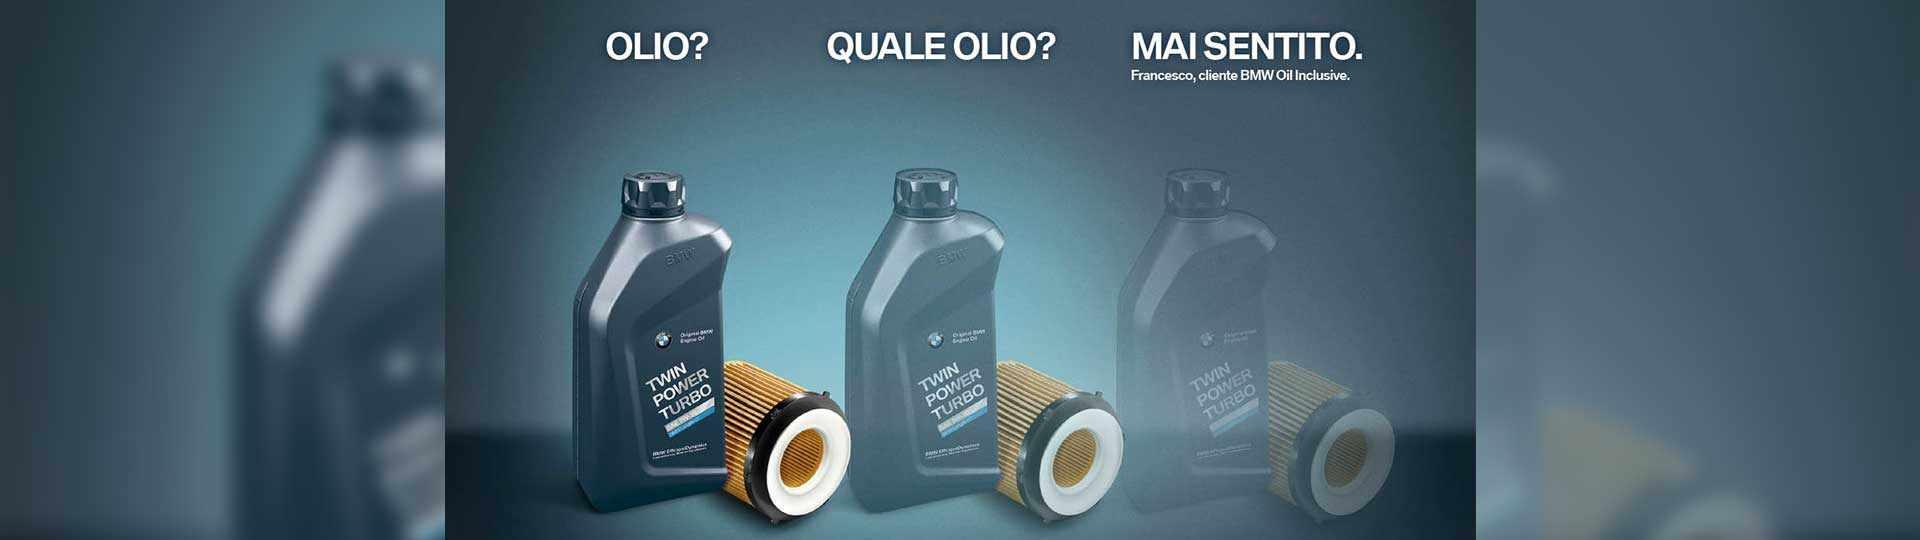 hd_oil_inclusive.jpg